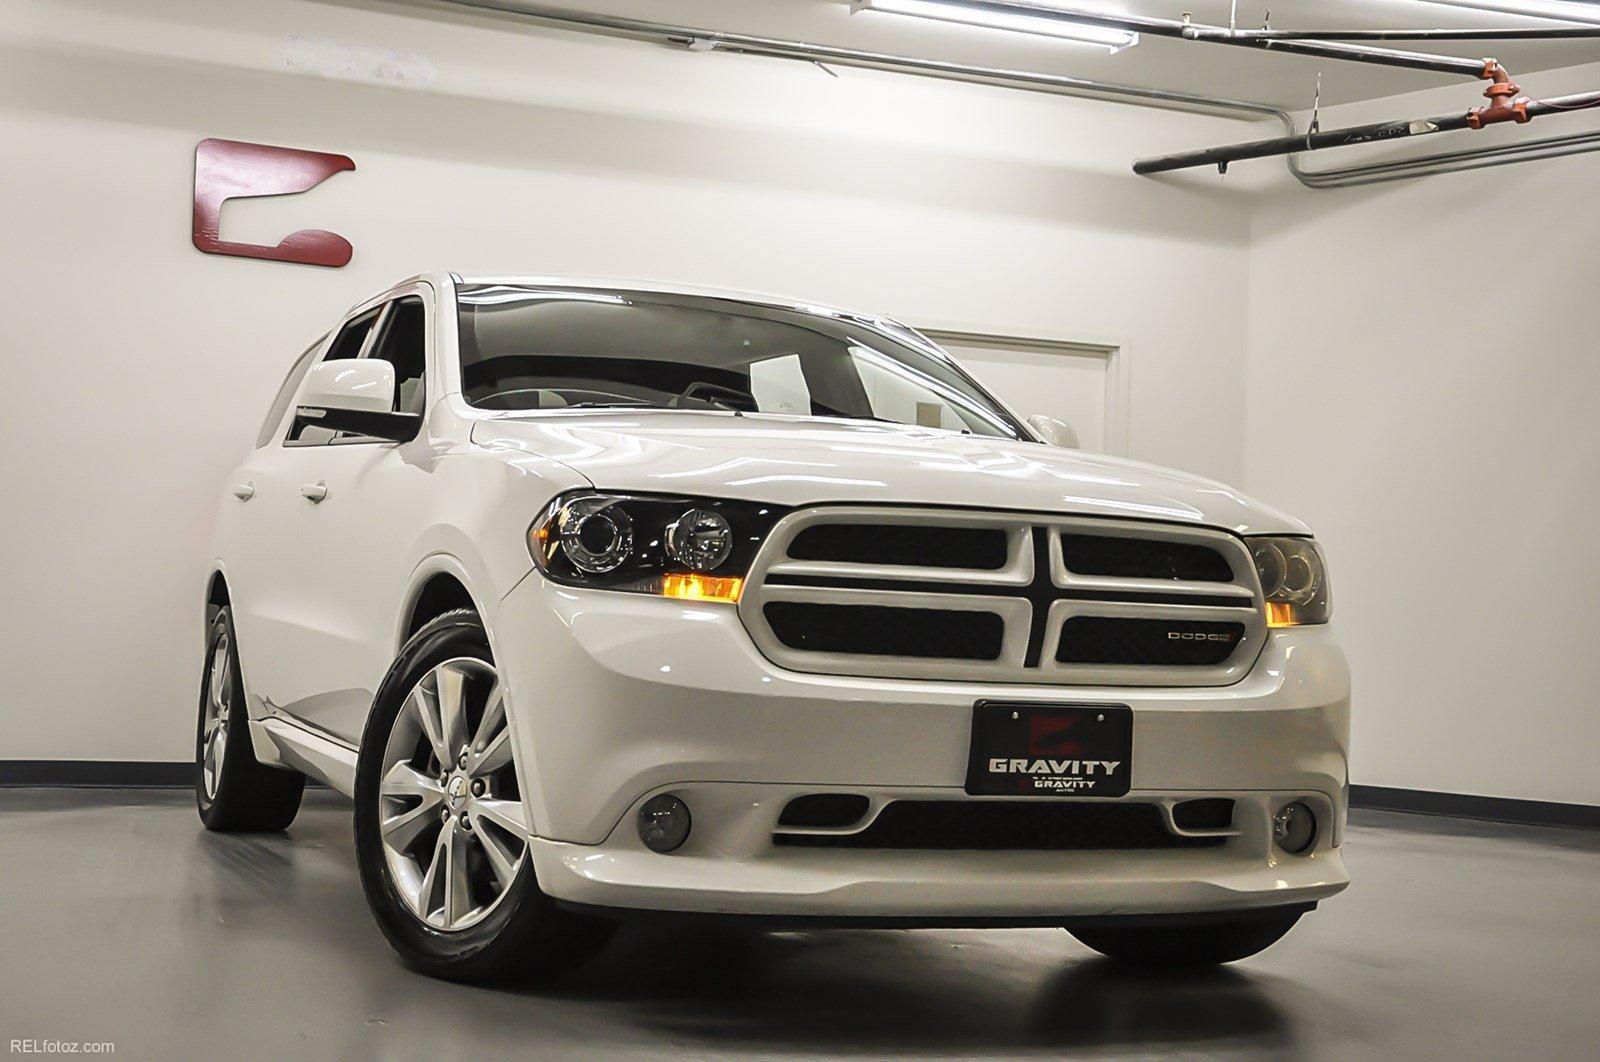 2012 Dodge Durango R T Stock 330979 For Sale Near Marietta Ga Wiring Harness Used